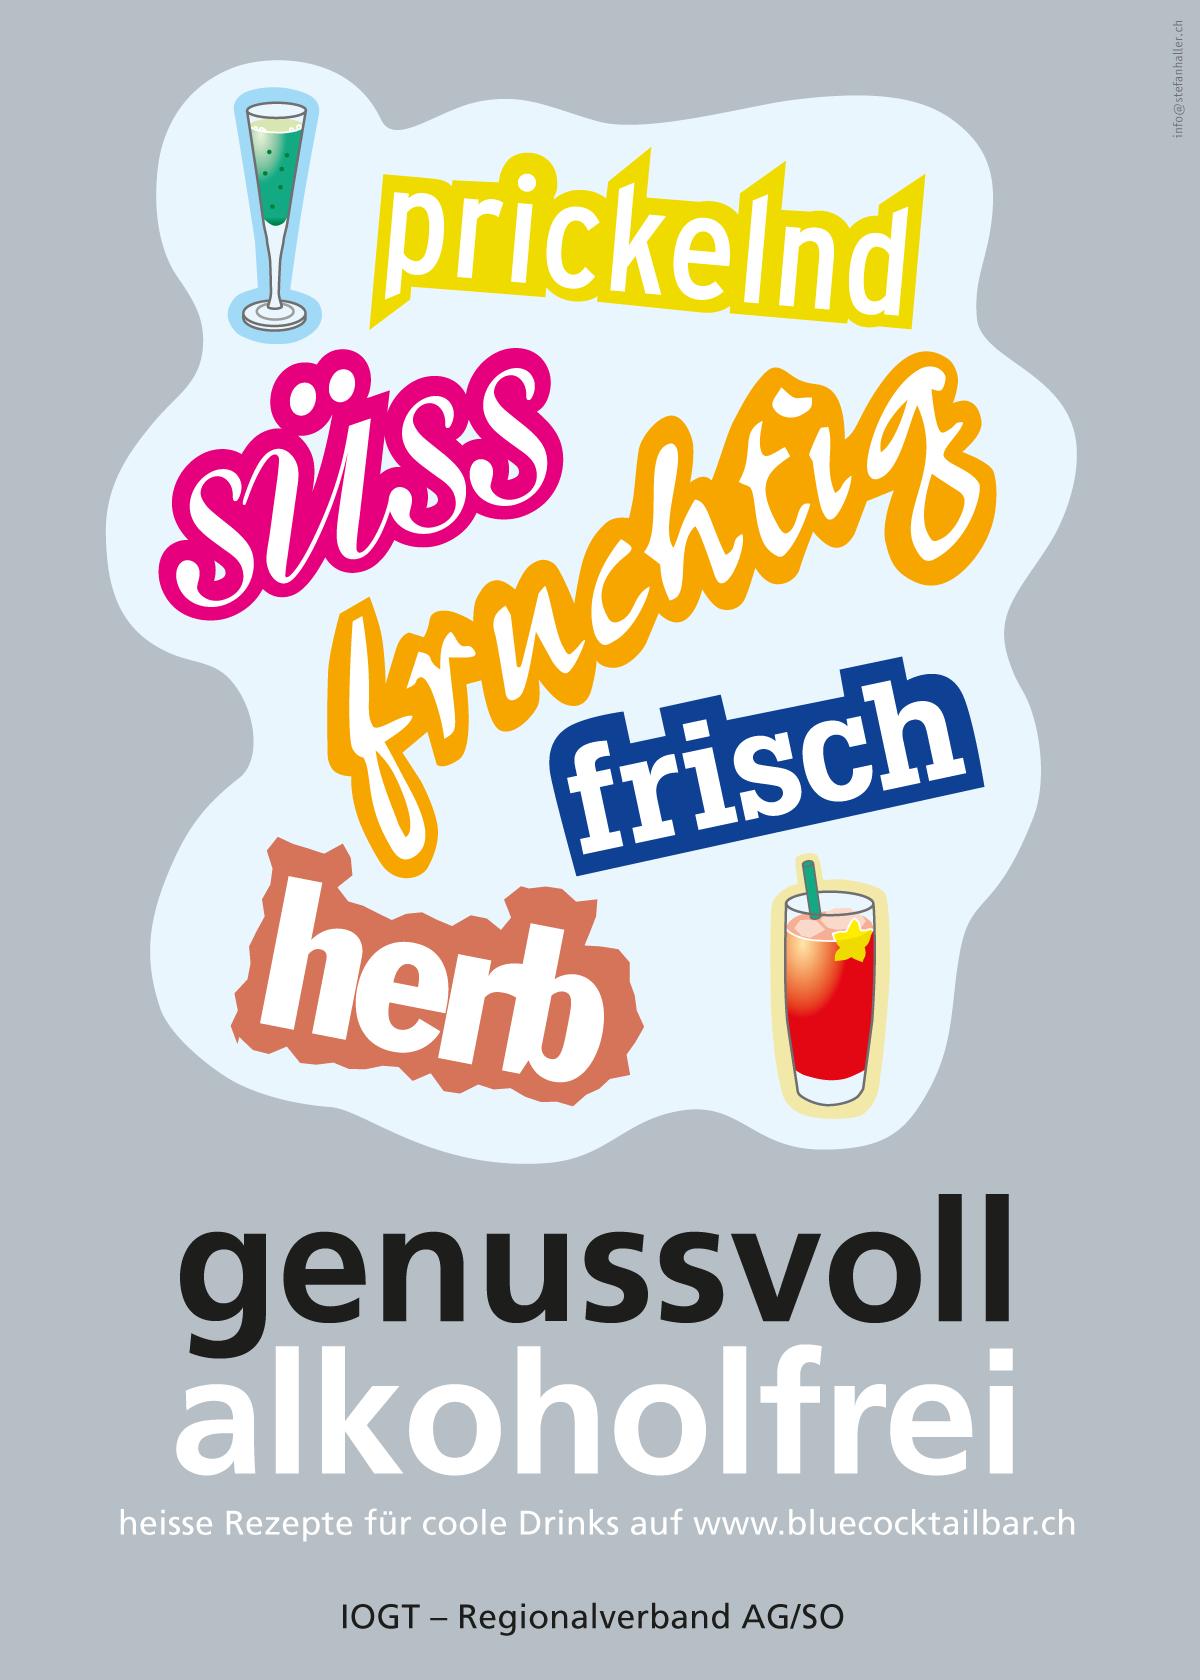 genussvoll akoholfrei